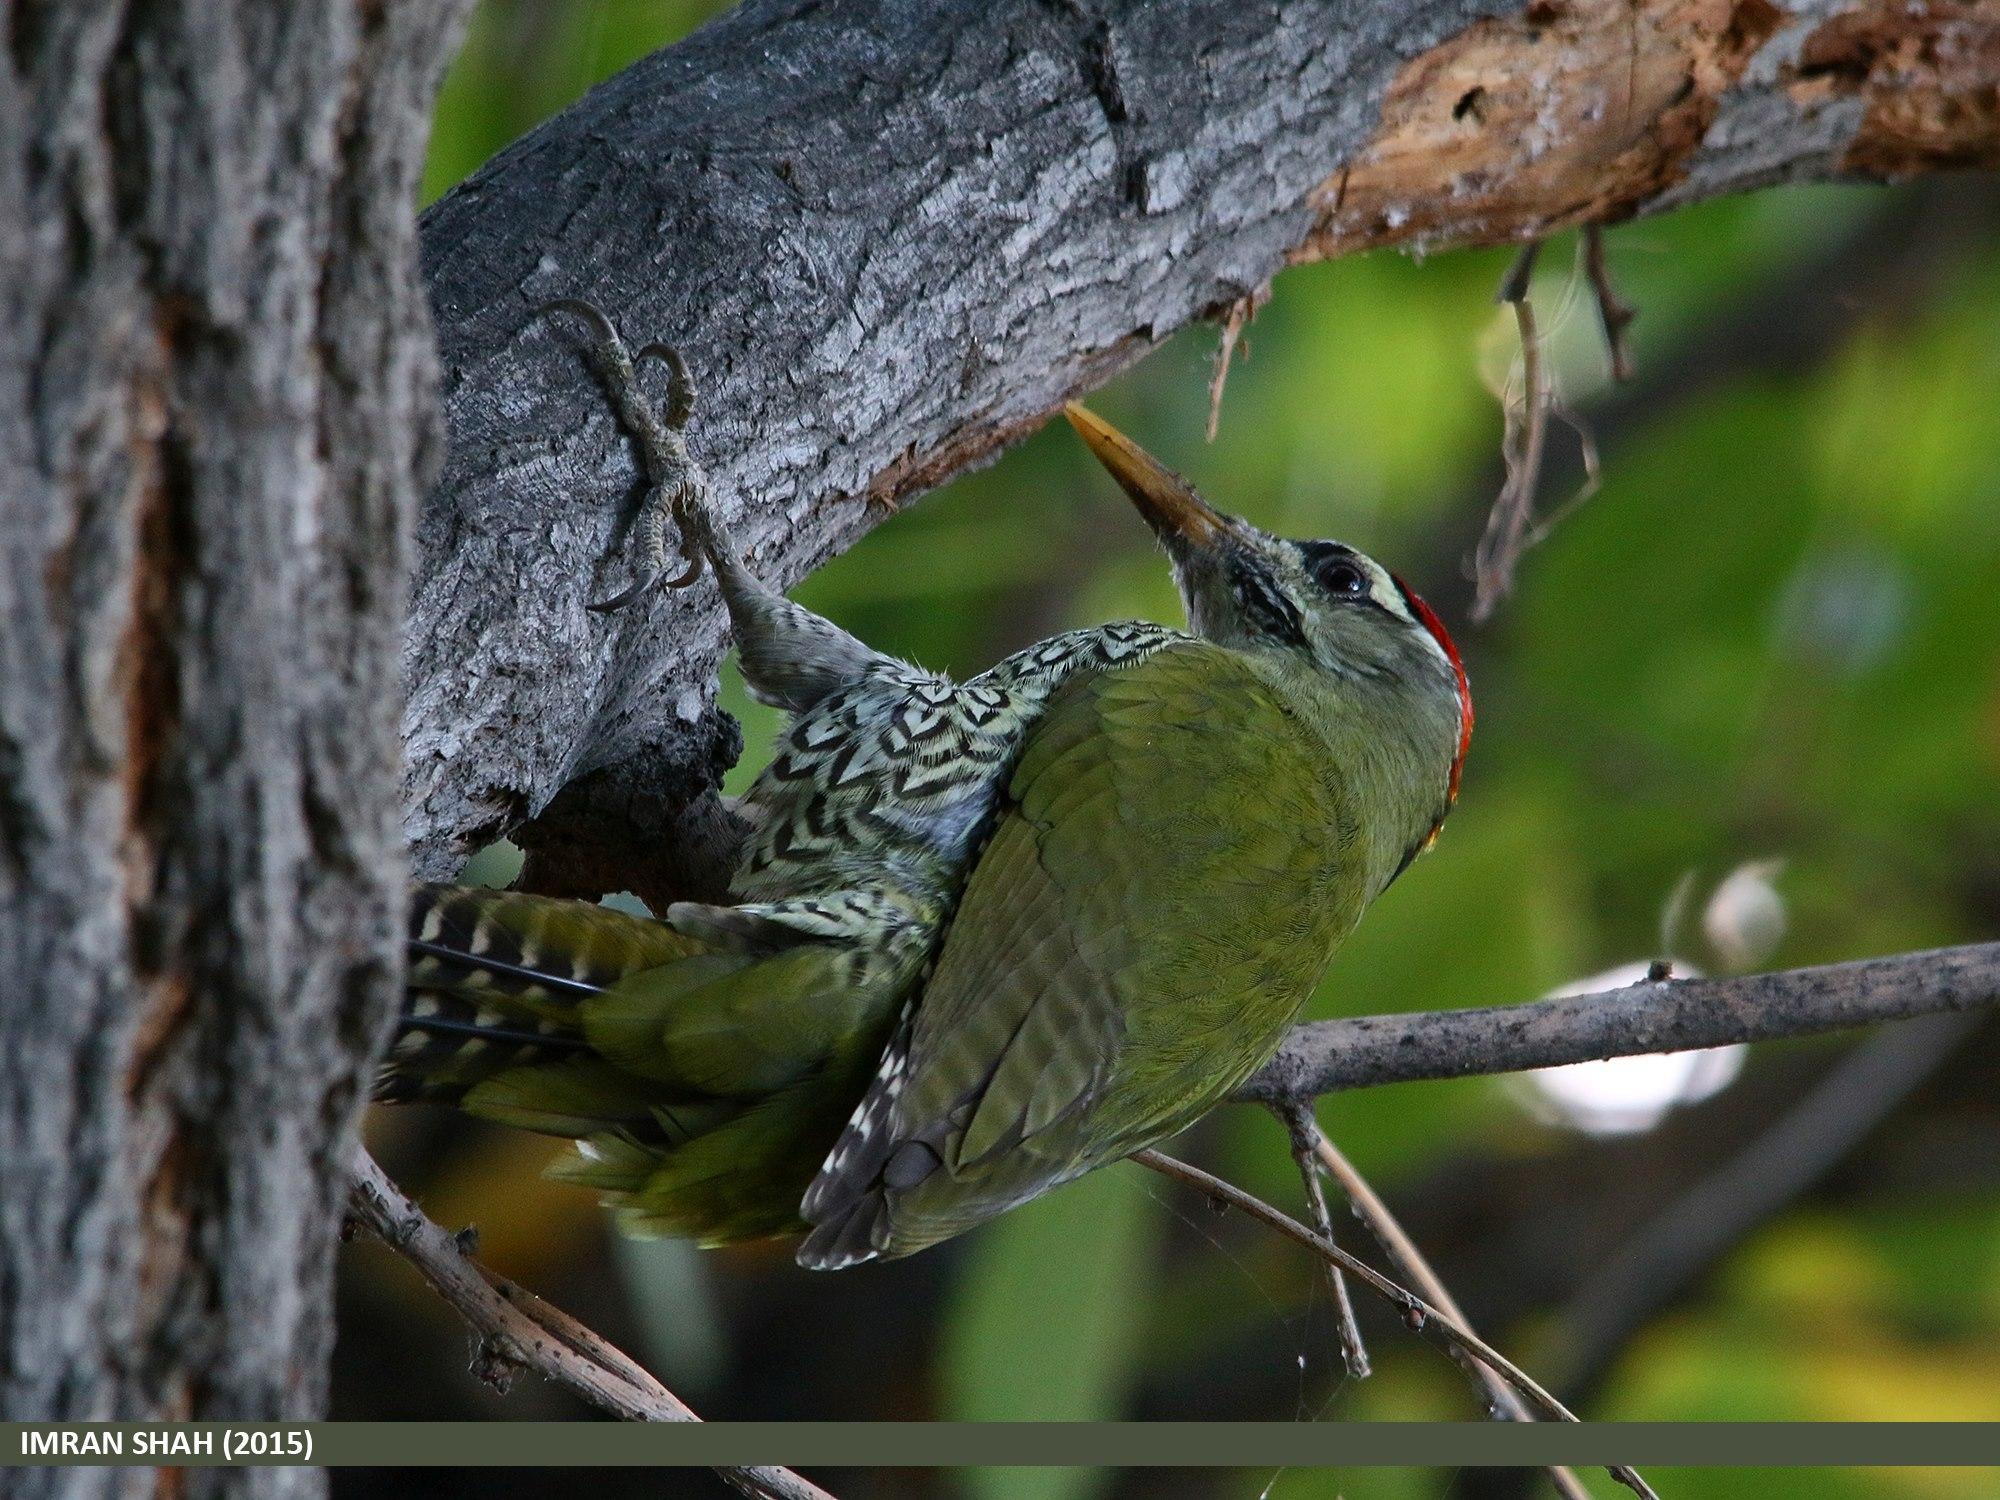 Scaly-bellied Woodpecker (Picus squamatus) captured at Jutial, Gilgit, Gilgit-Baltistan, Pakistan